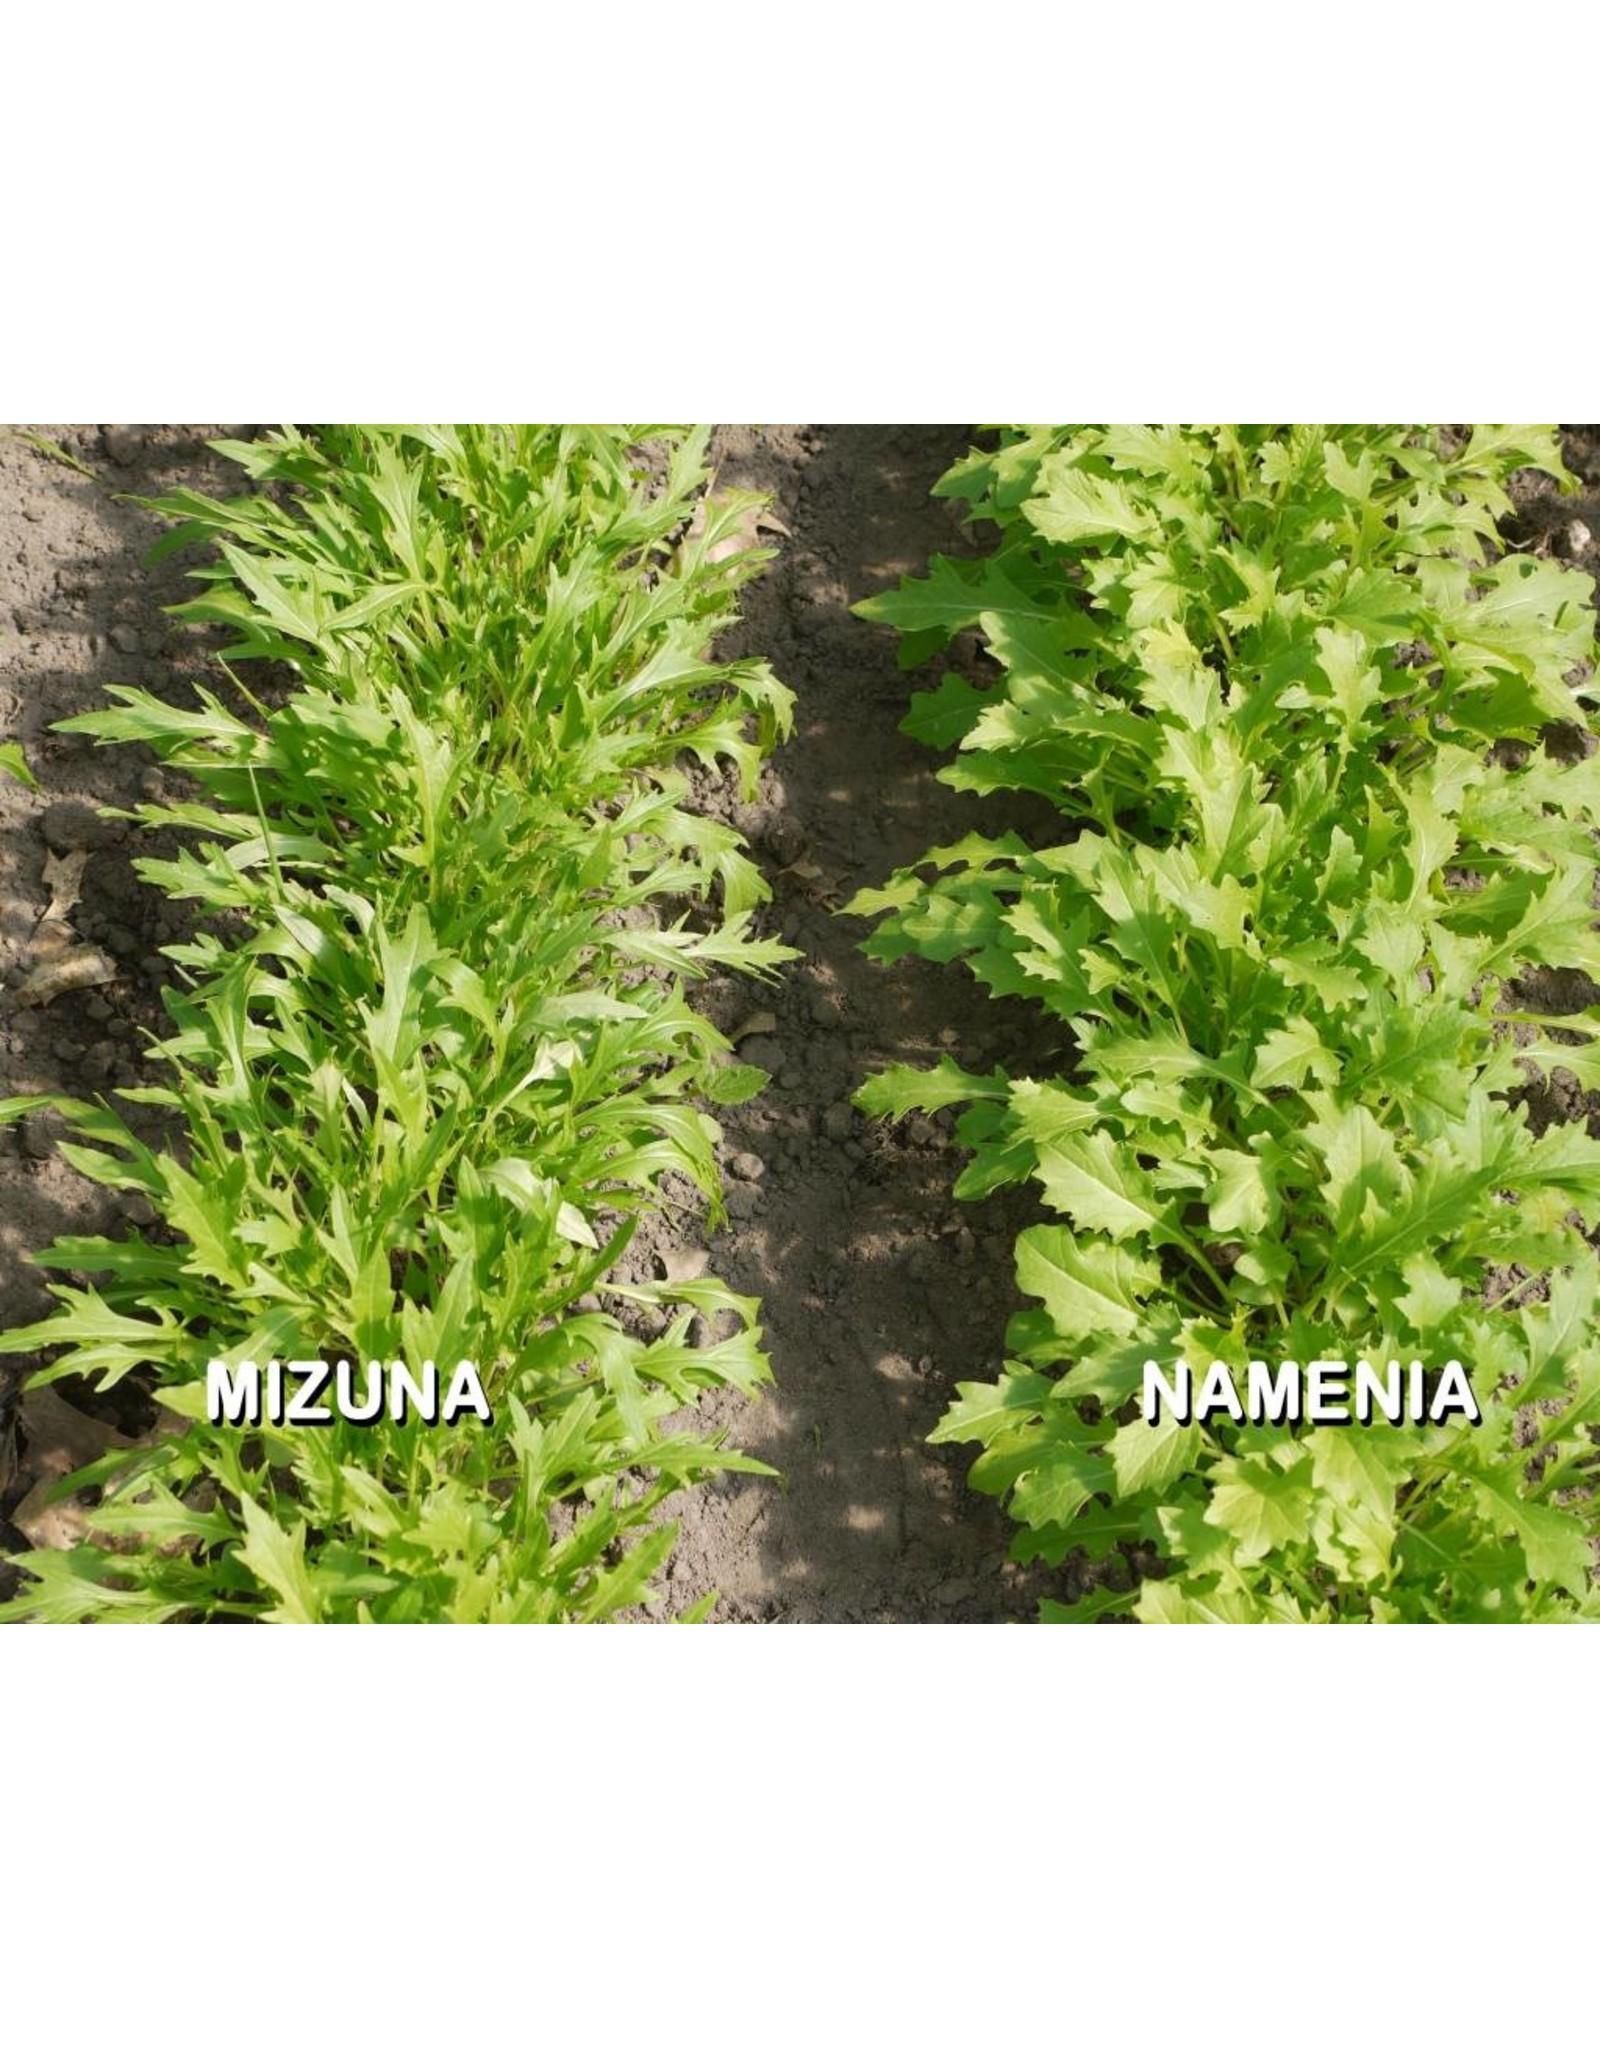 Bladgroenten Namenia - Brassica rapa subsp. campestris